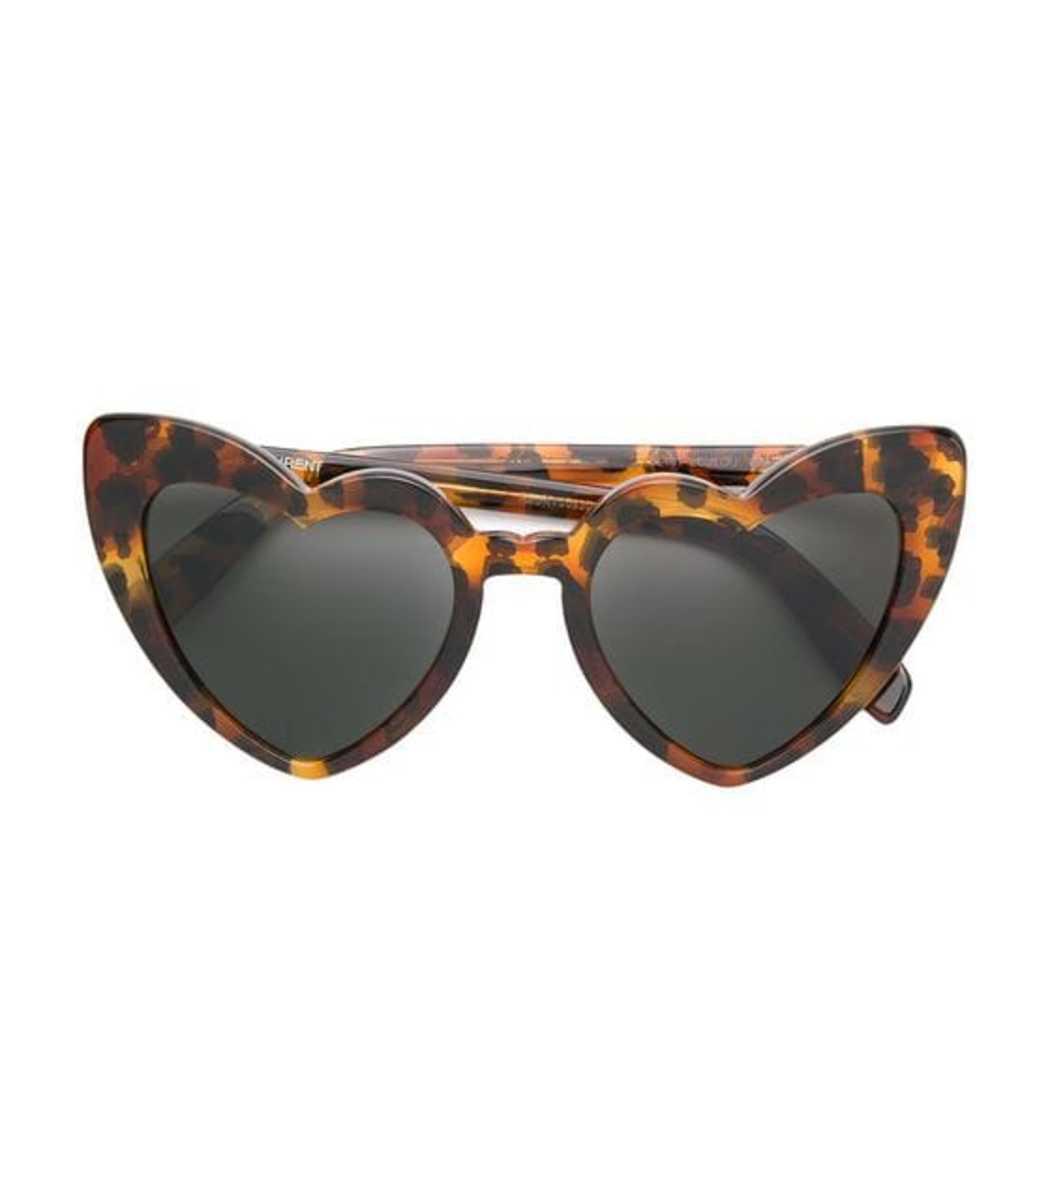 b346a0a934e Saint Laurent Lou Lou Oversized Heart Sunglasses In Brown